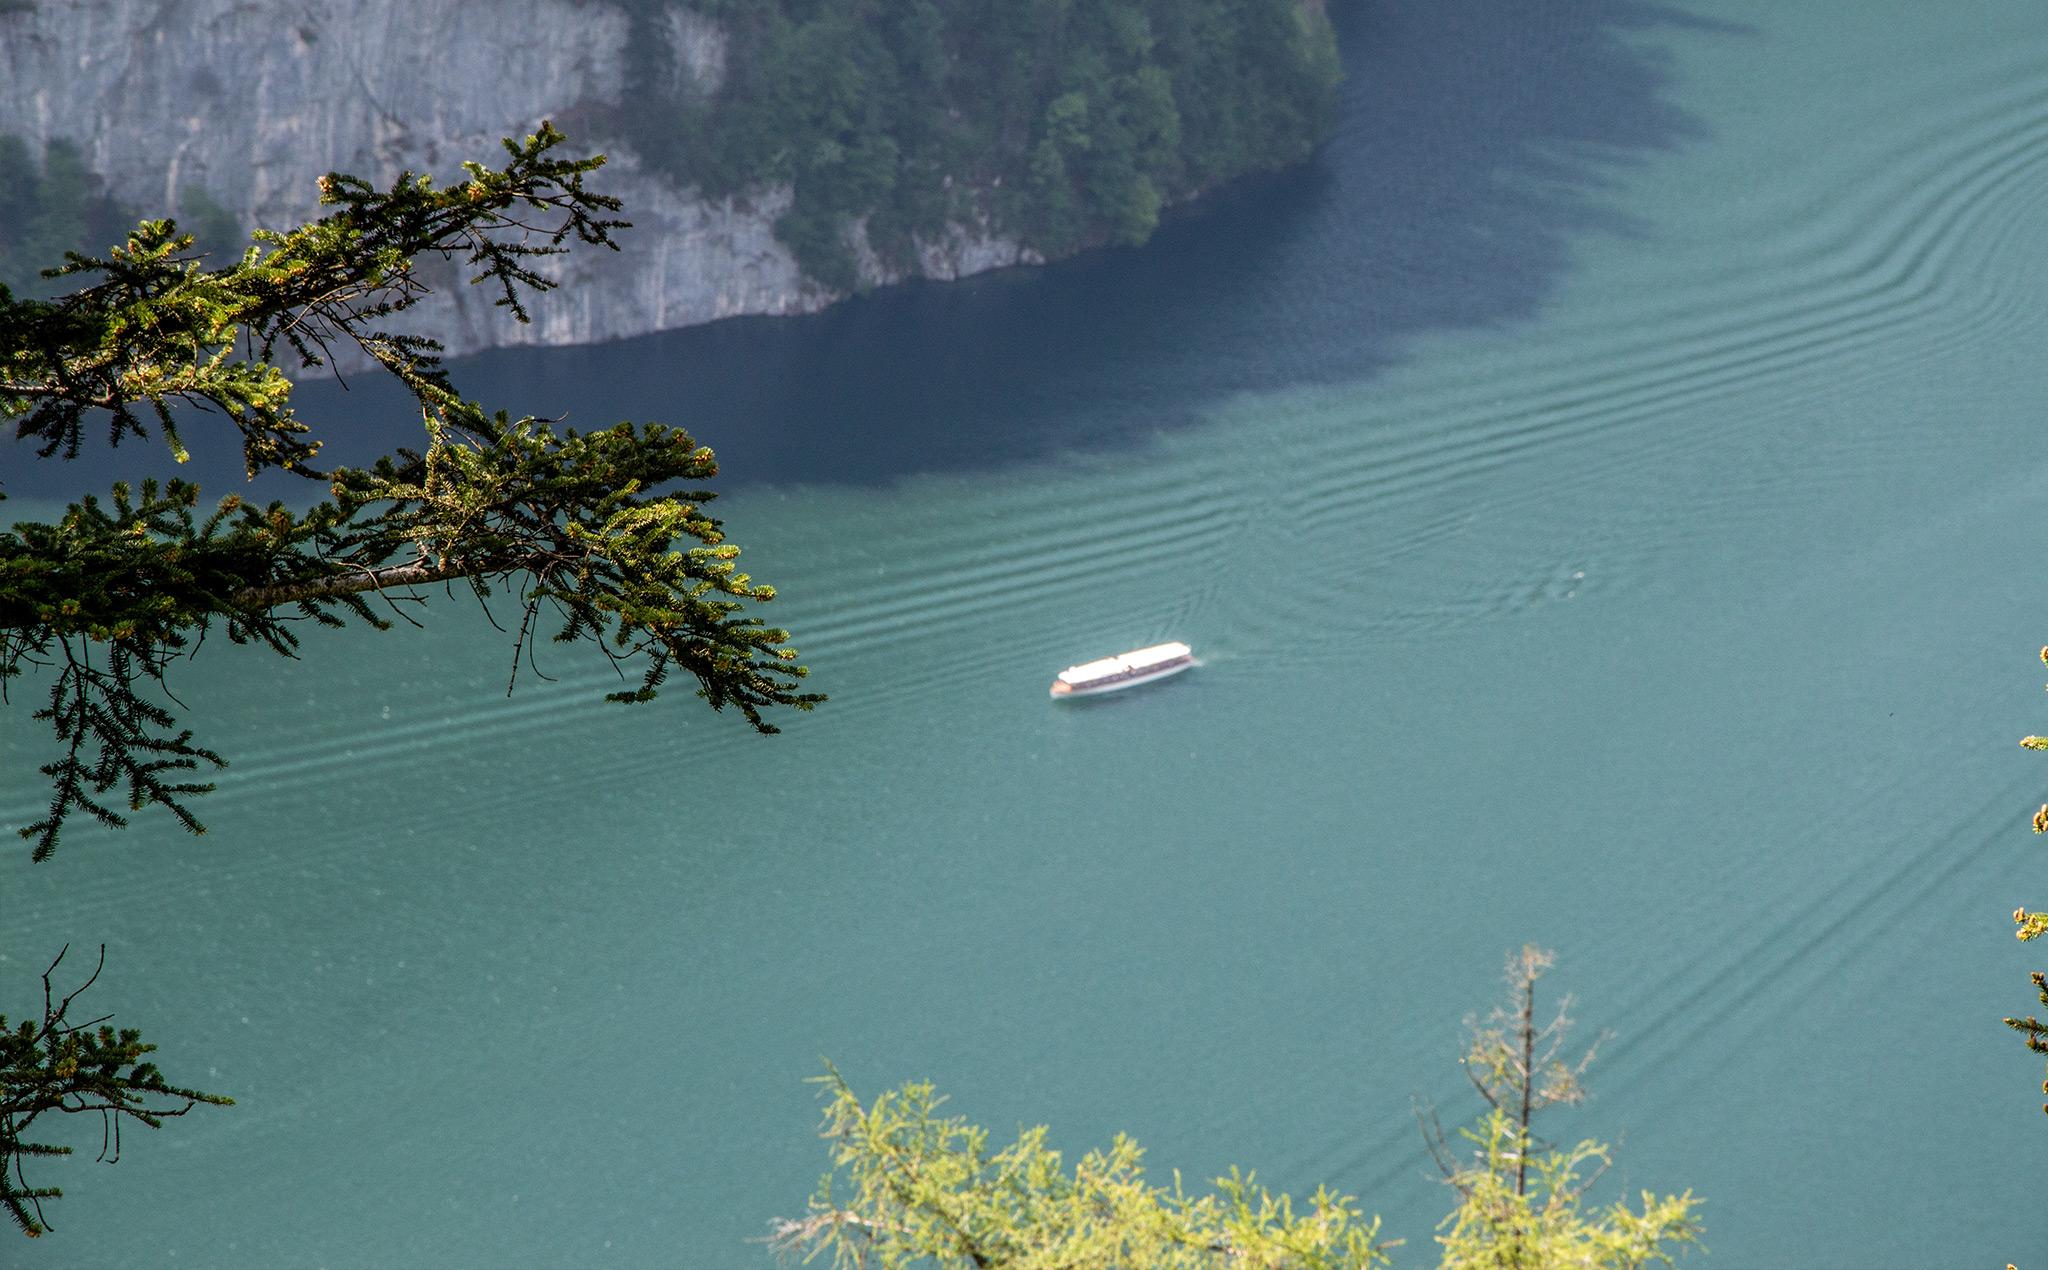 Ein Elektroboot der Köigsseeflotte